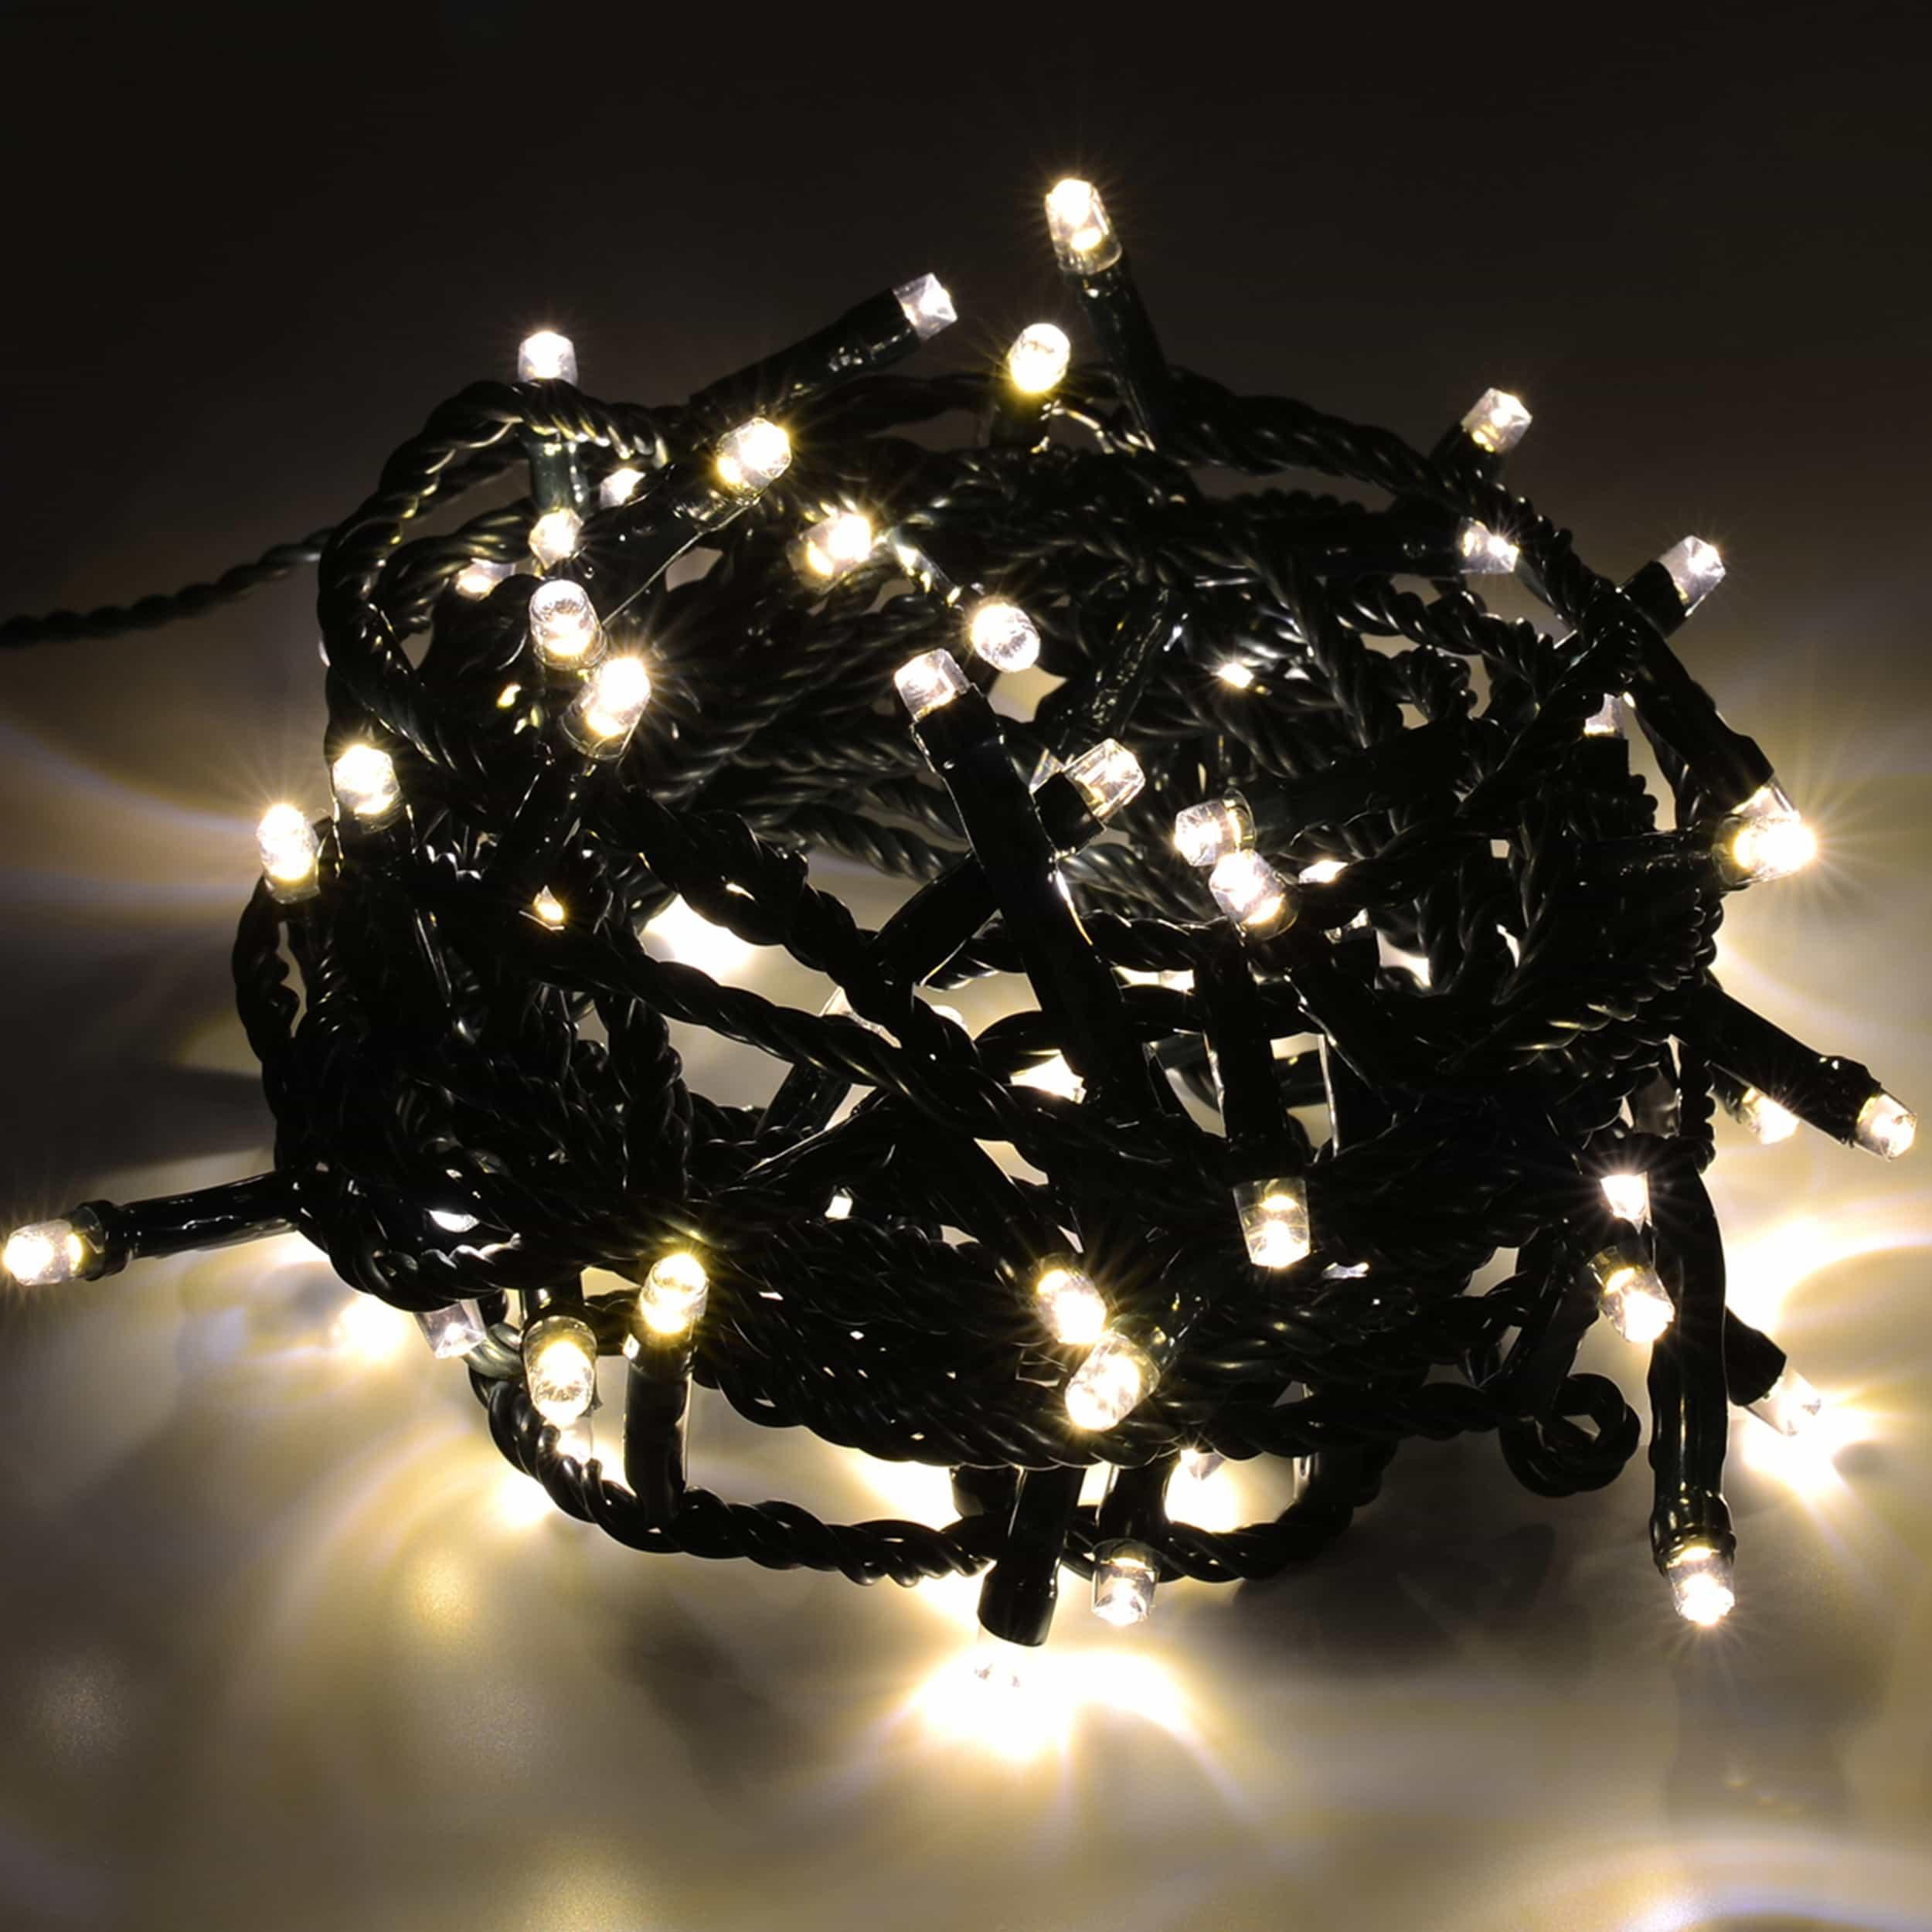 LED Lichterkette 80 LED energiesparend L4m warmweiß